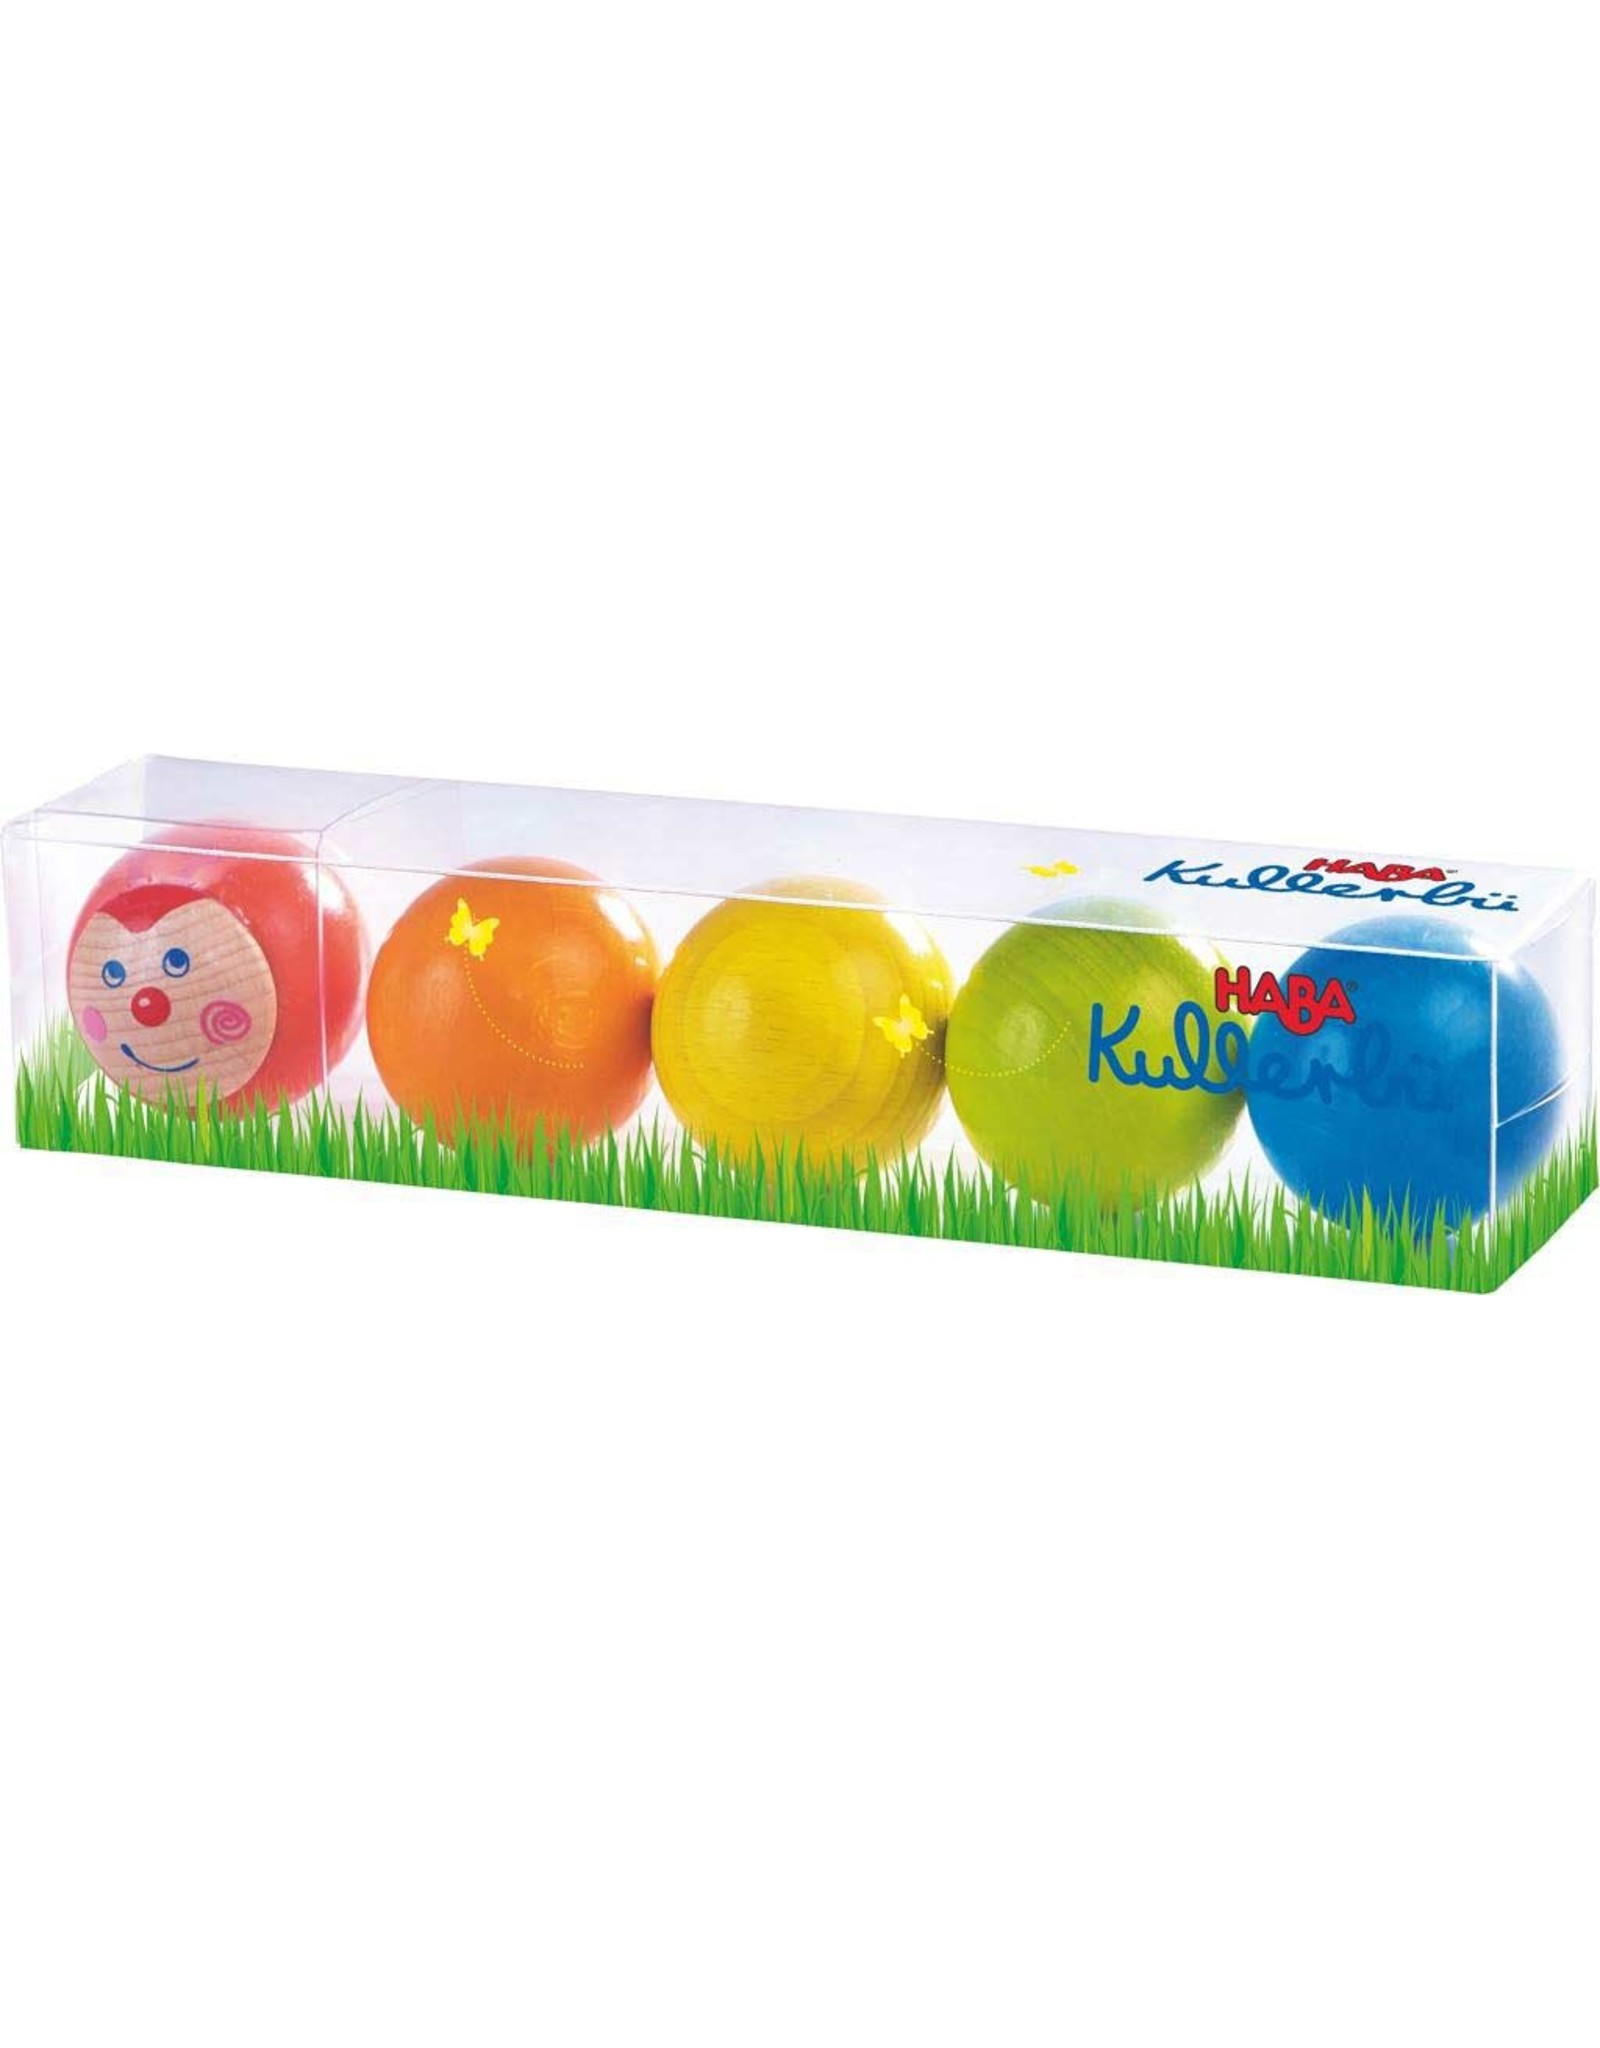 Haba Kullerbu, Caterpillar Balls